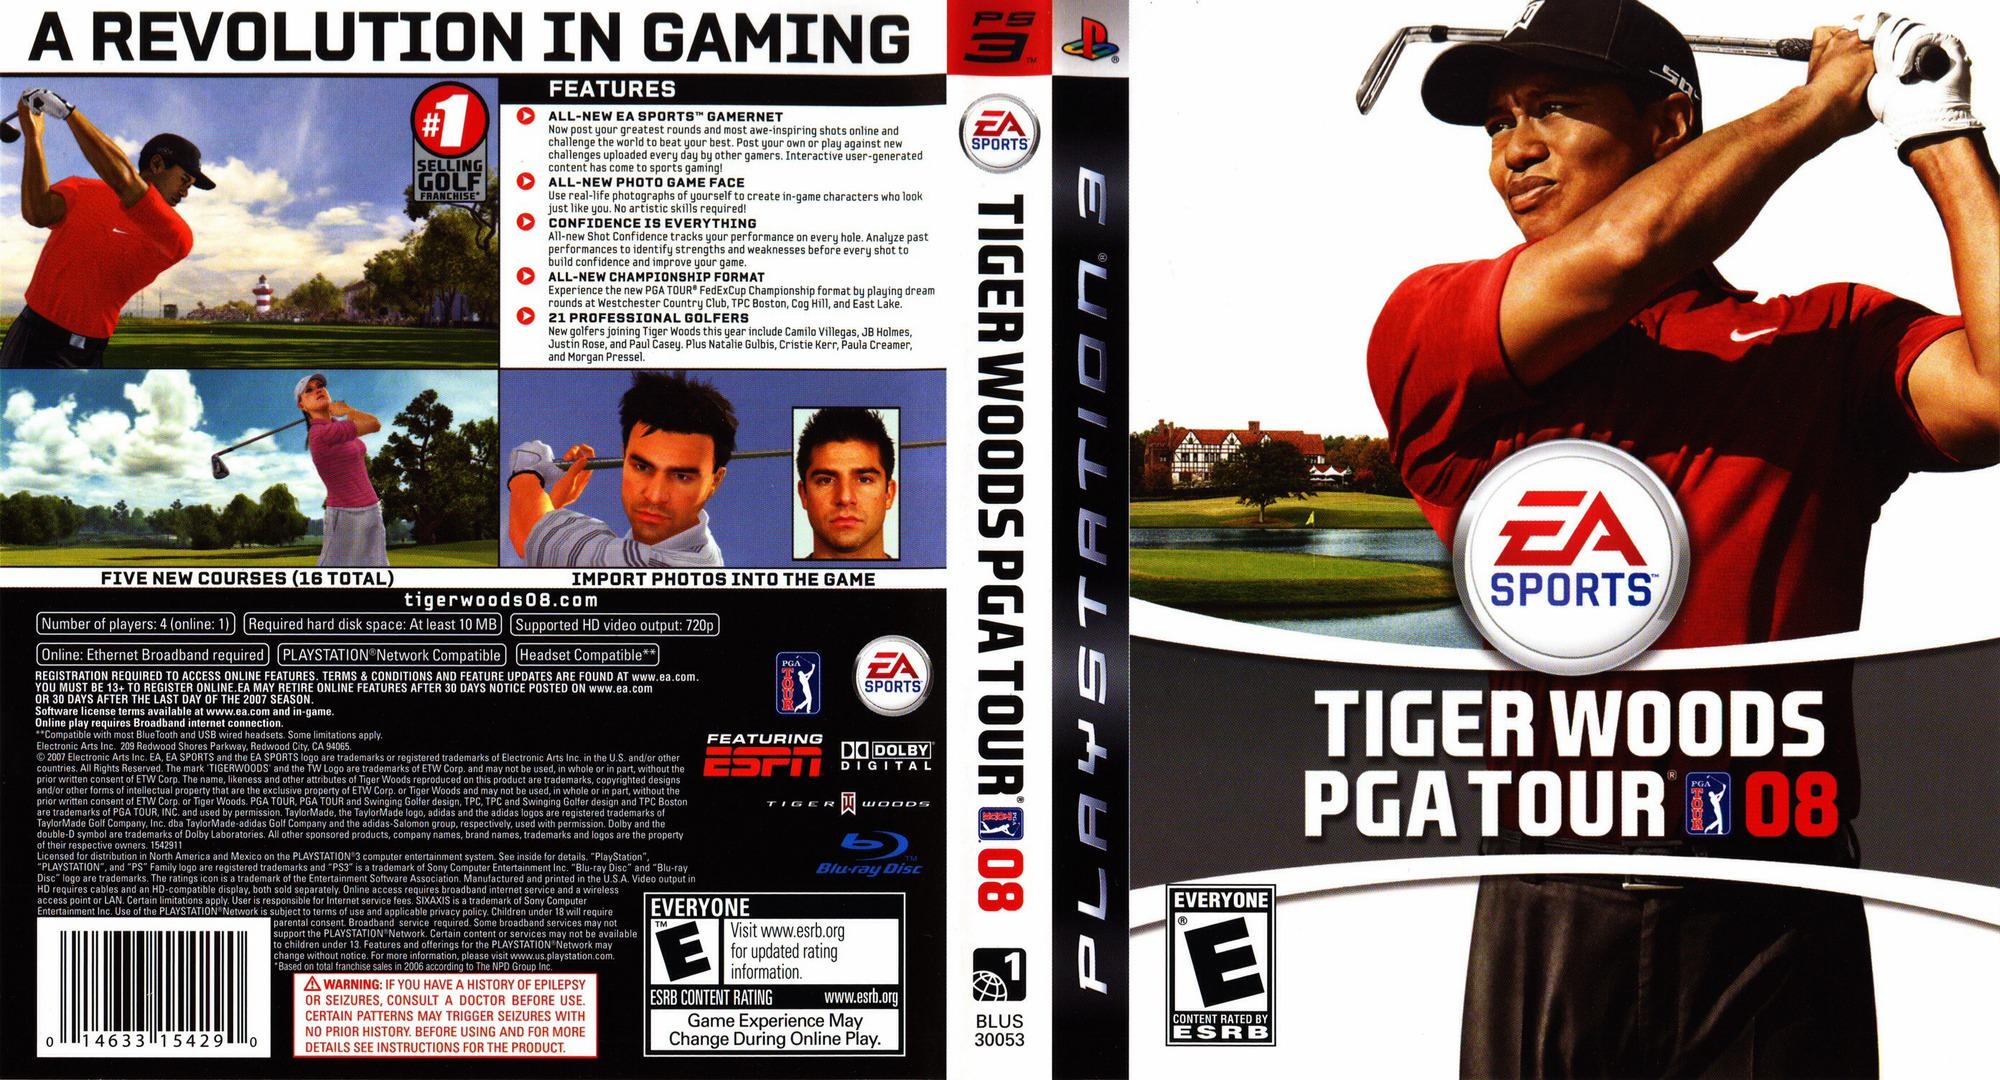 Tiger Woods PGA Tour 08 PS3 coverfullHQ (BLUS30053)